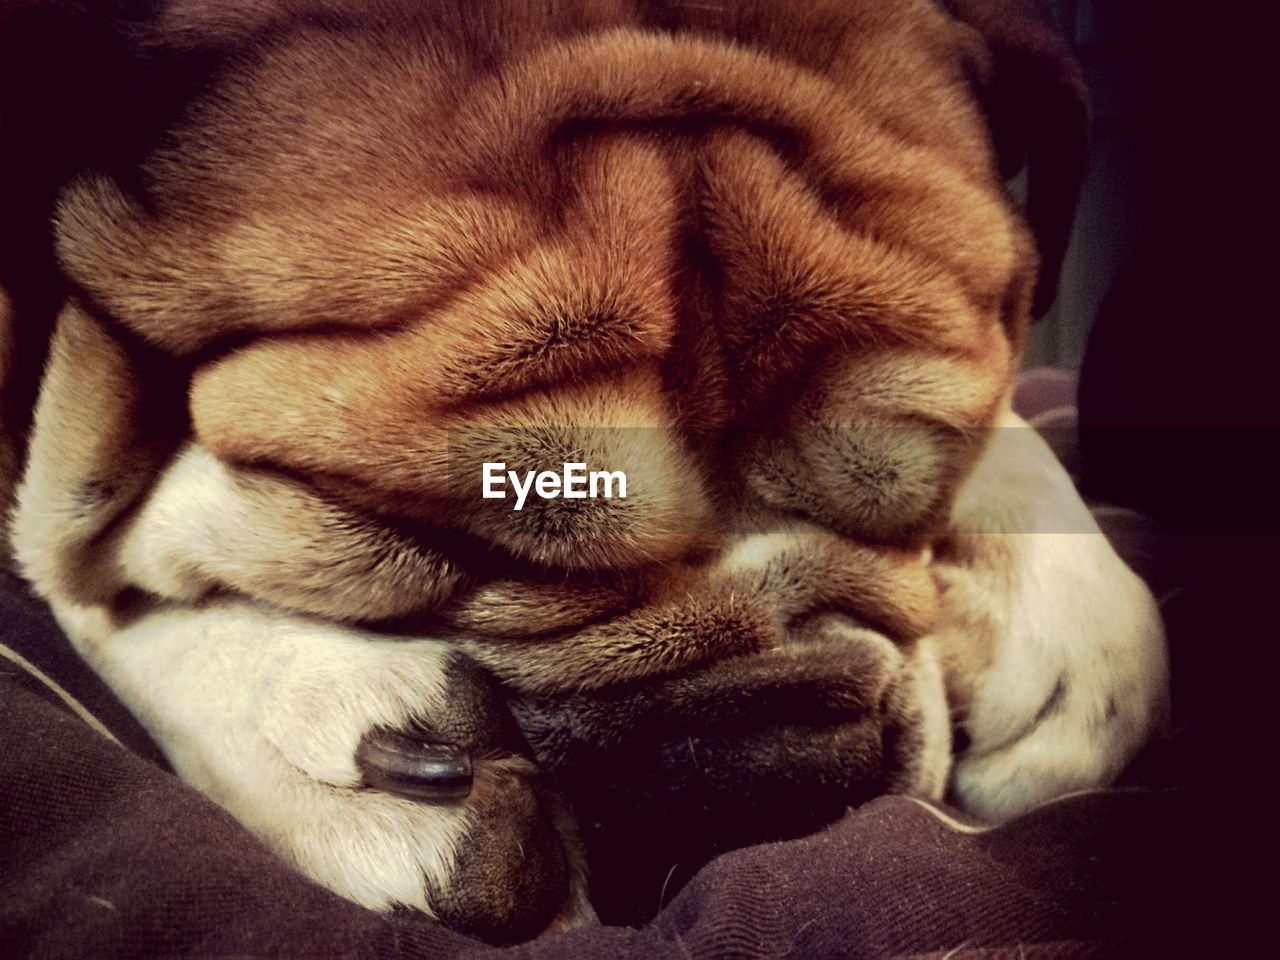 pets, one animal, sleeping, animal themes, domestic animals, mammal, paw, indoors, animal leg, dog, domestic cat, close-up, feline, relaxation, no people, day